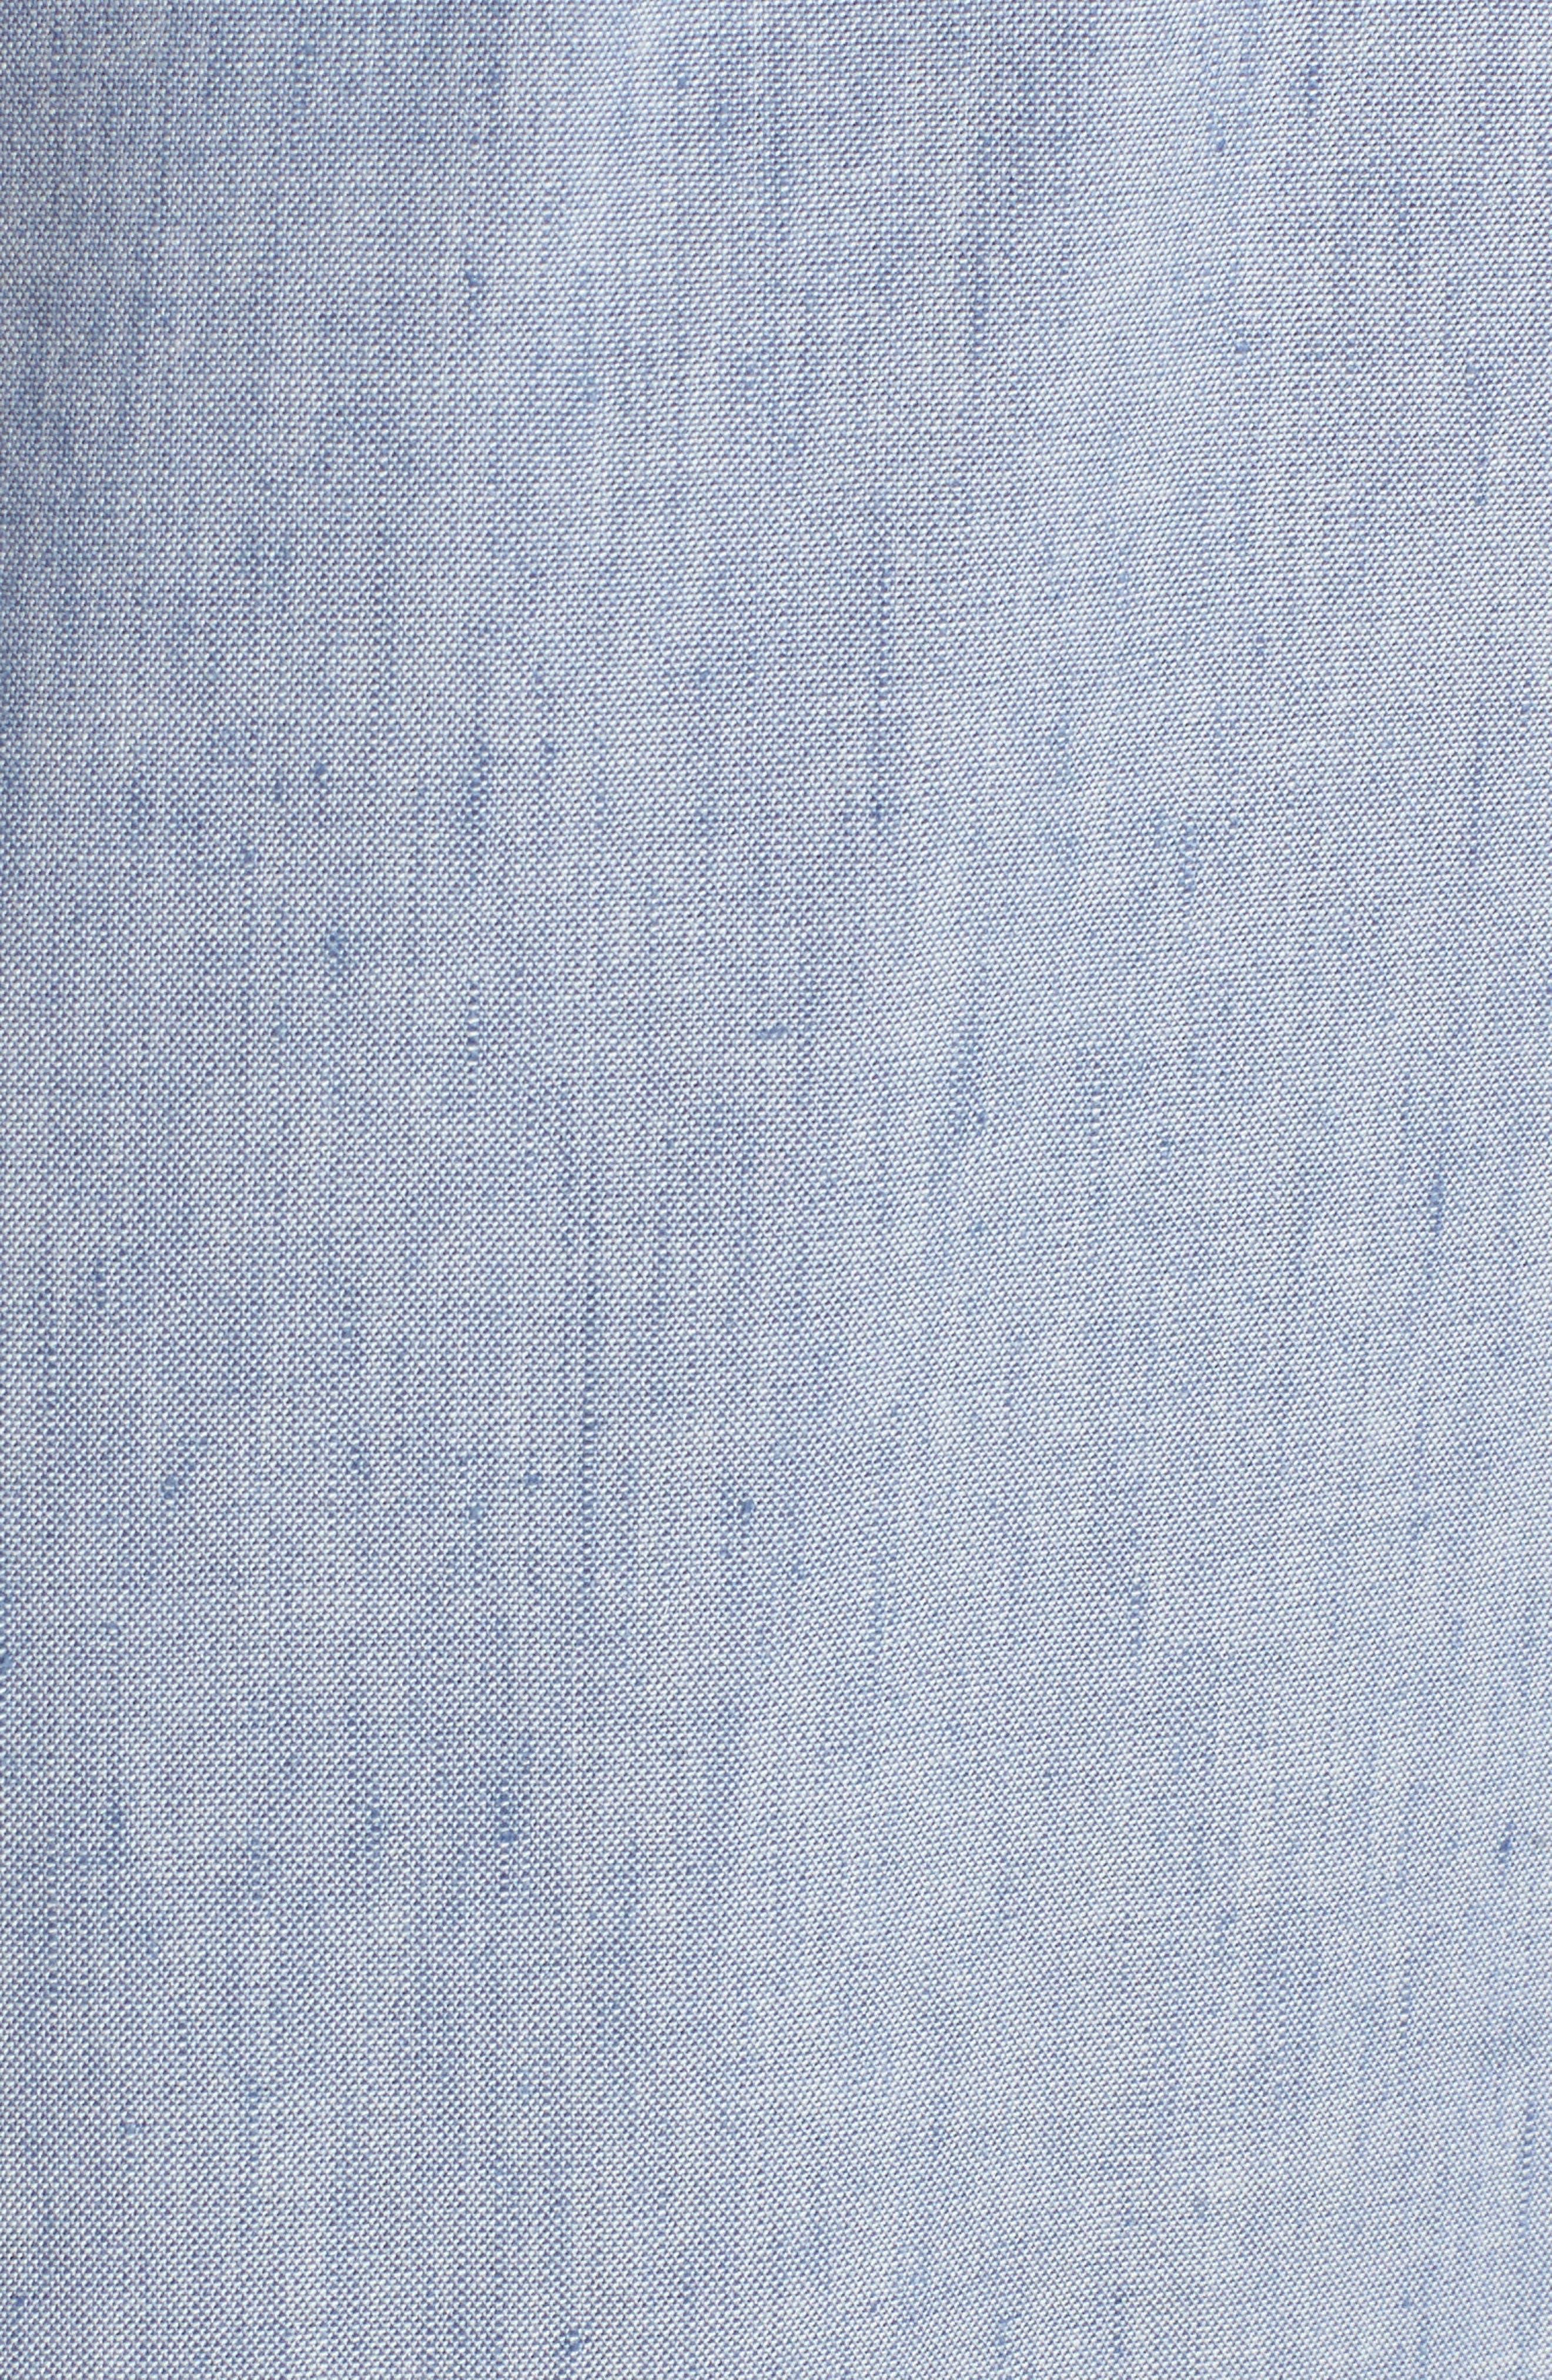 Tie Front Chambray Linen Blend Dress,                             Alternate thumbnail 6, color,                             400